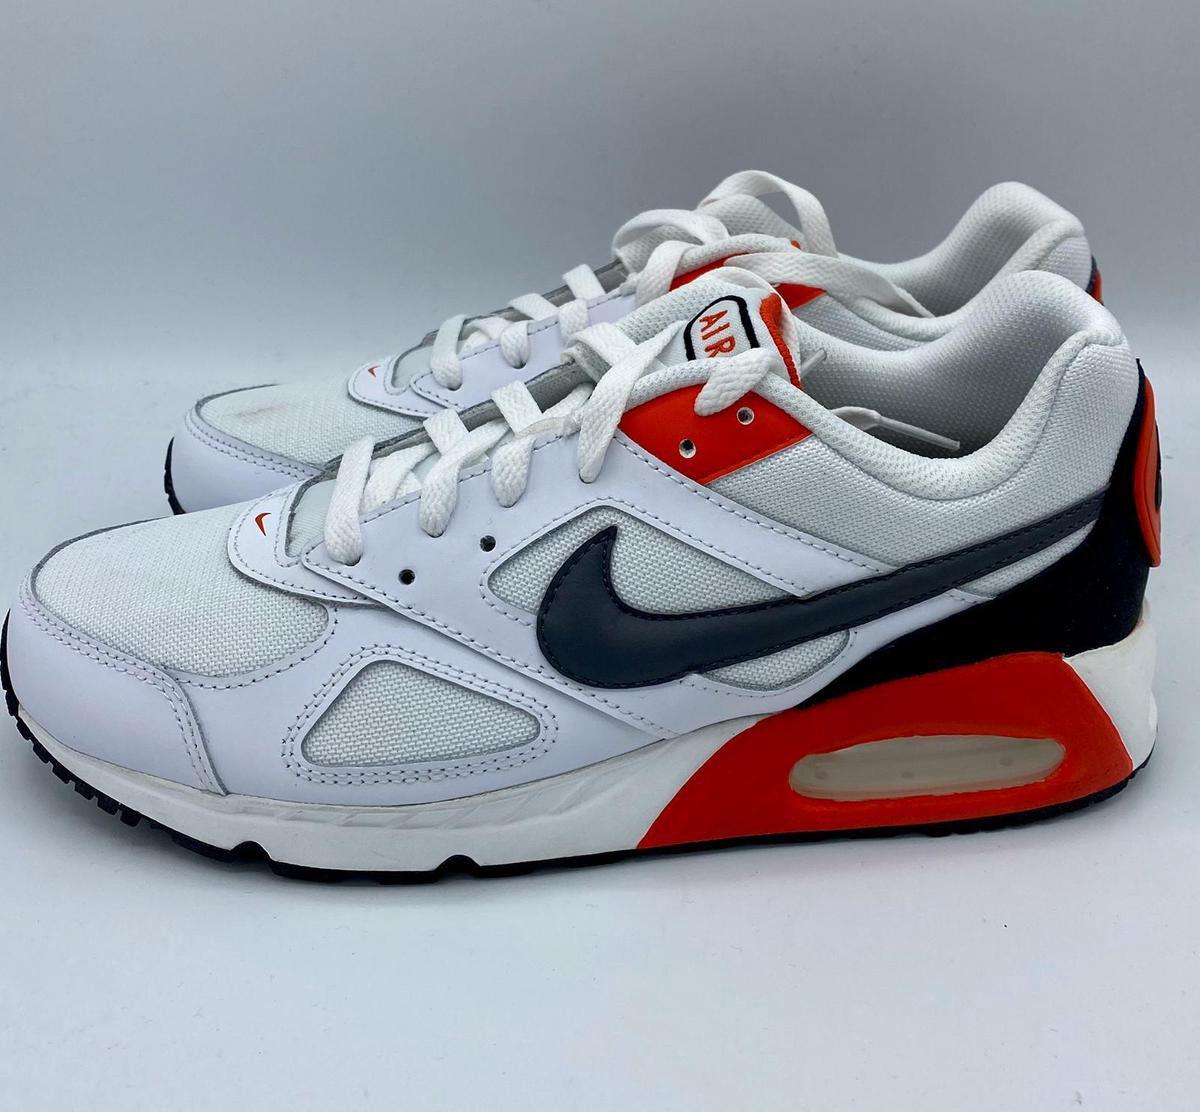 Nike Air Max IVO (Habanero Rood) Maat 41